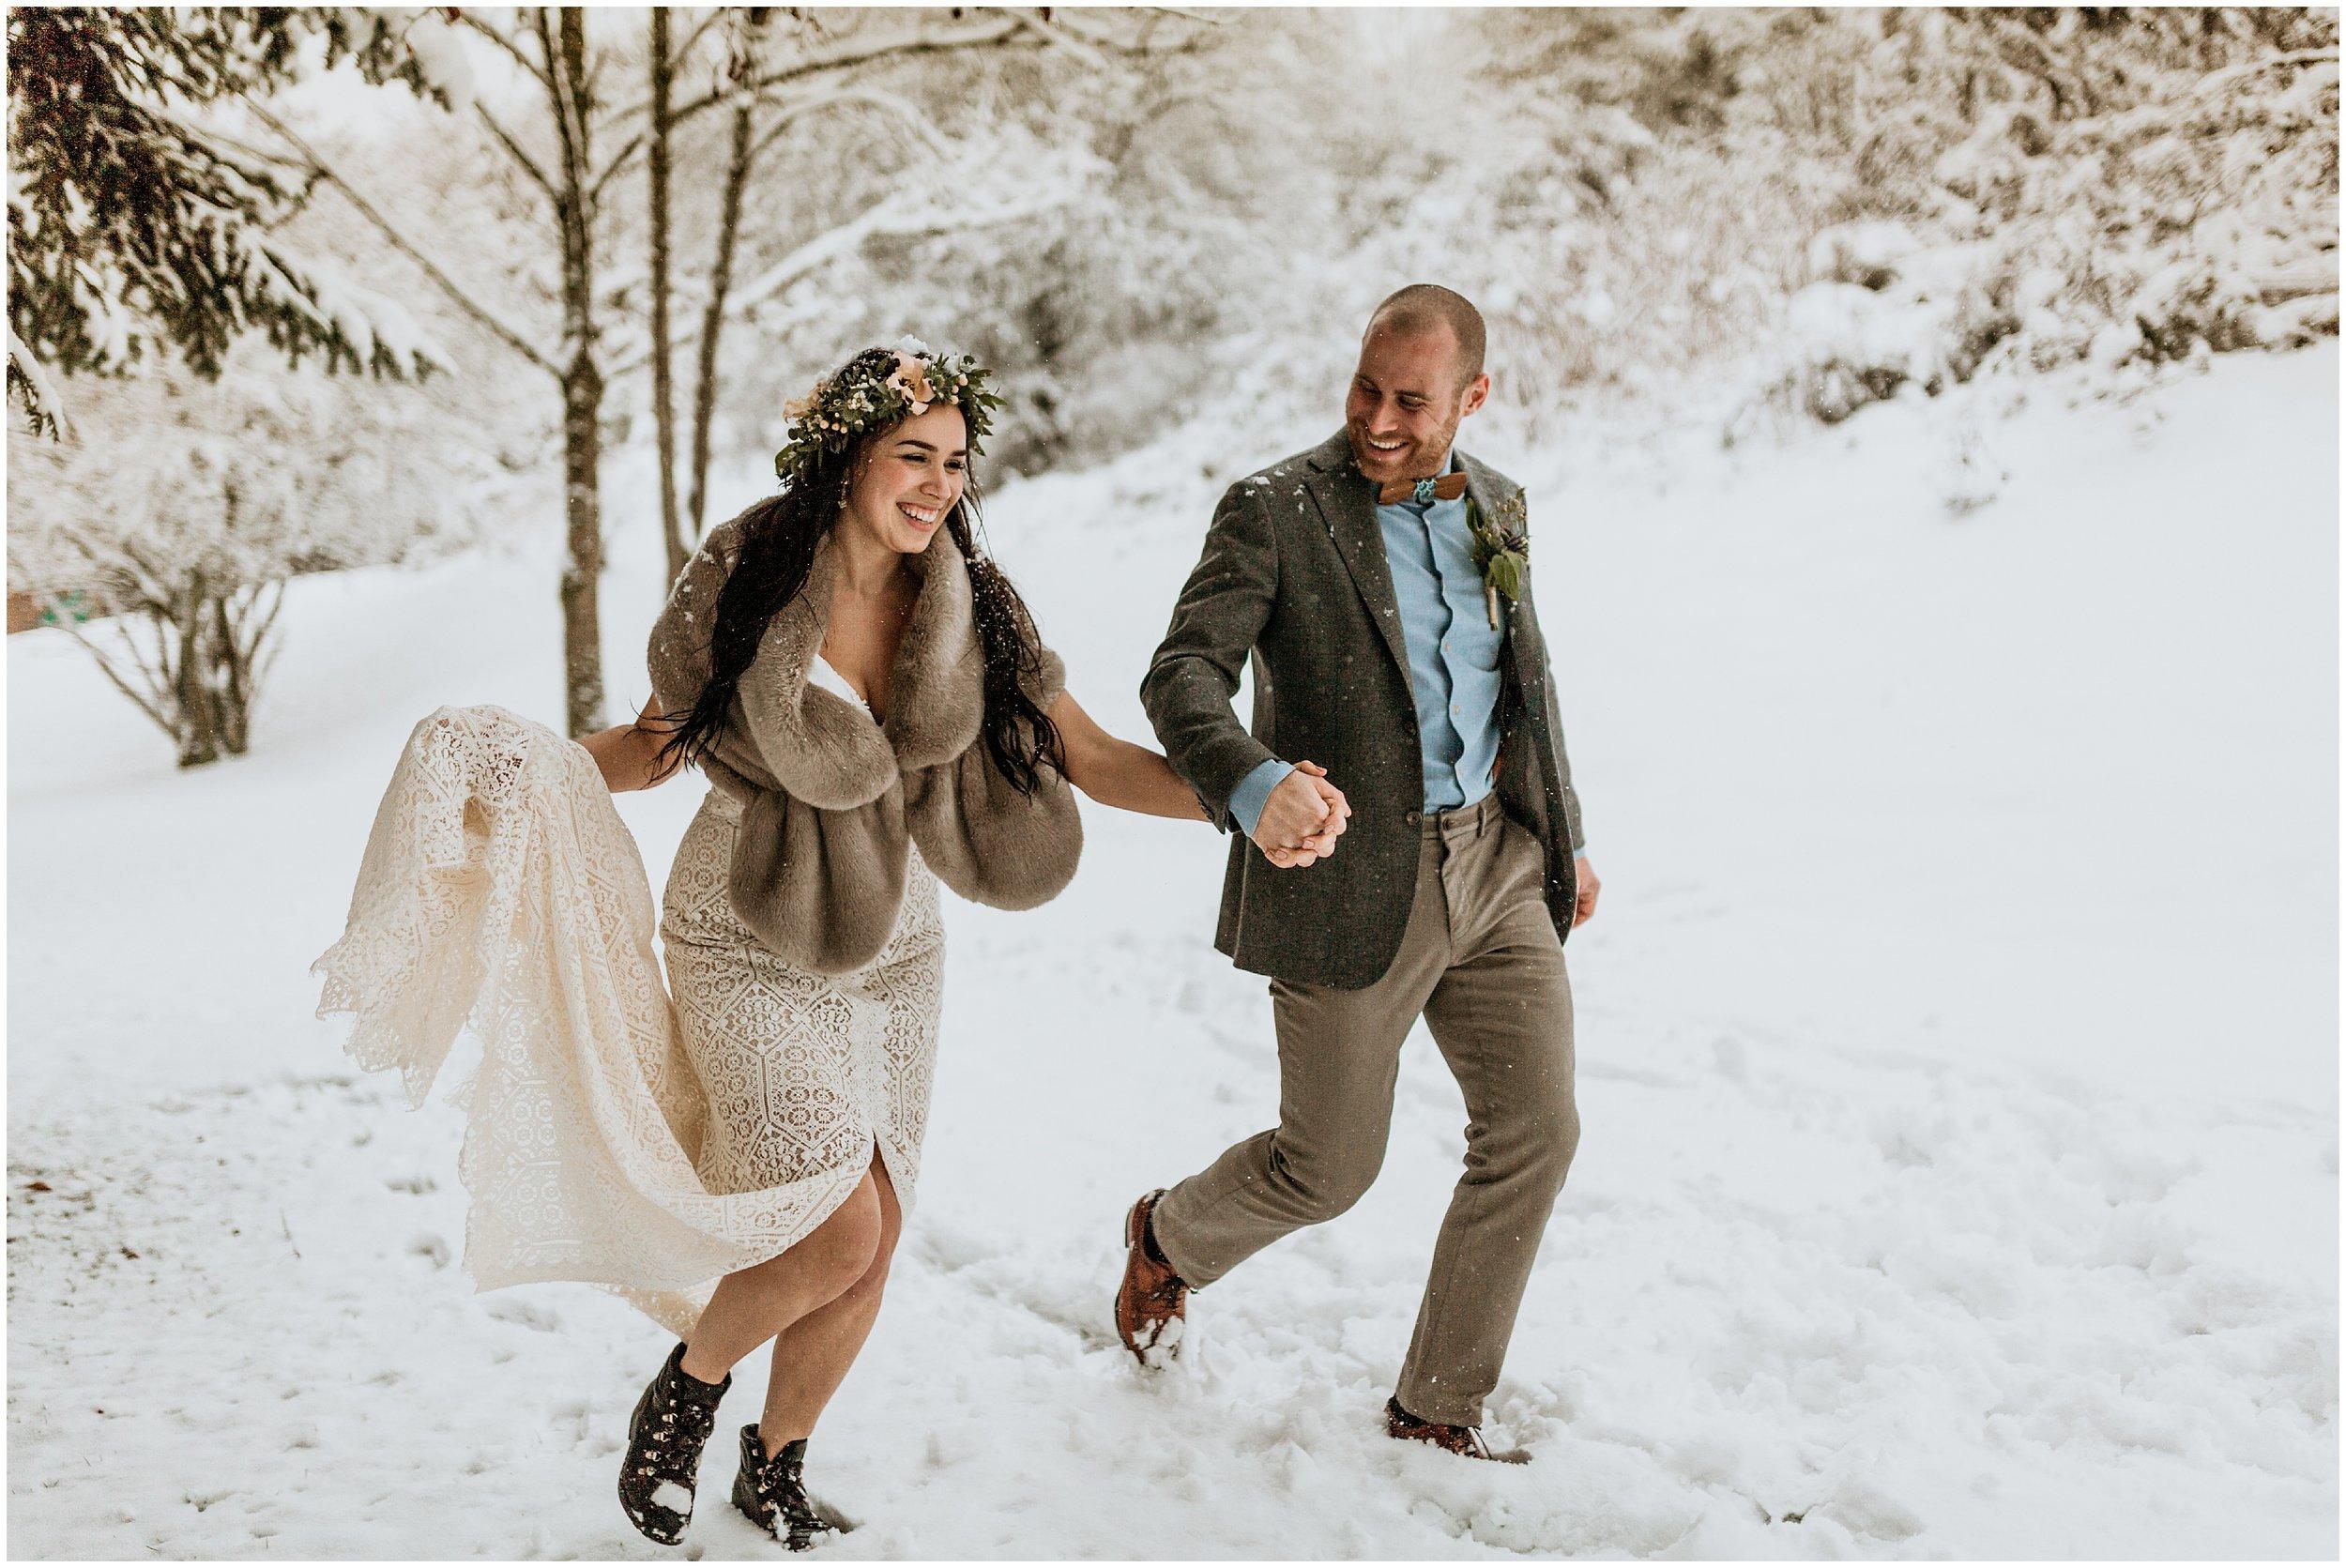 huwelijksfotografie-jana-joeri-ardennen-sechery_0020.jpg